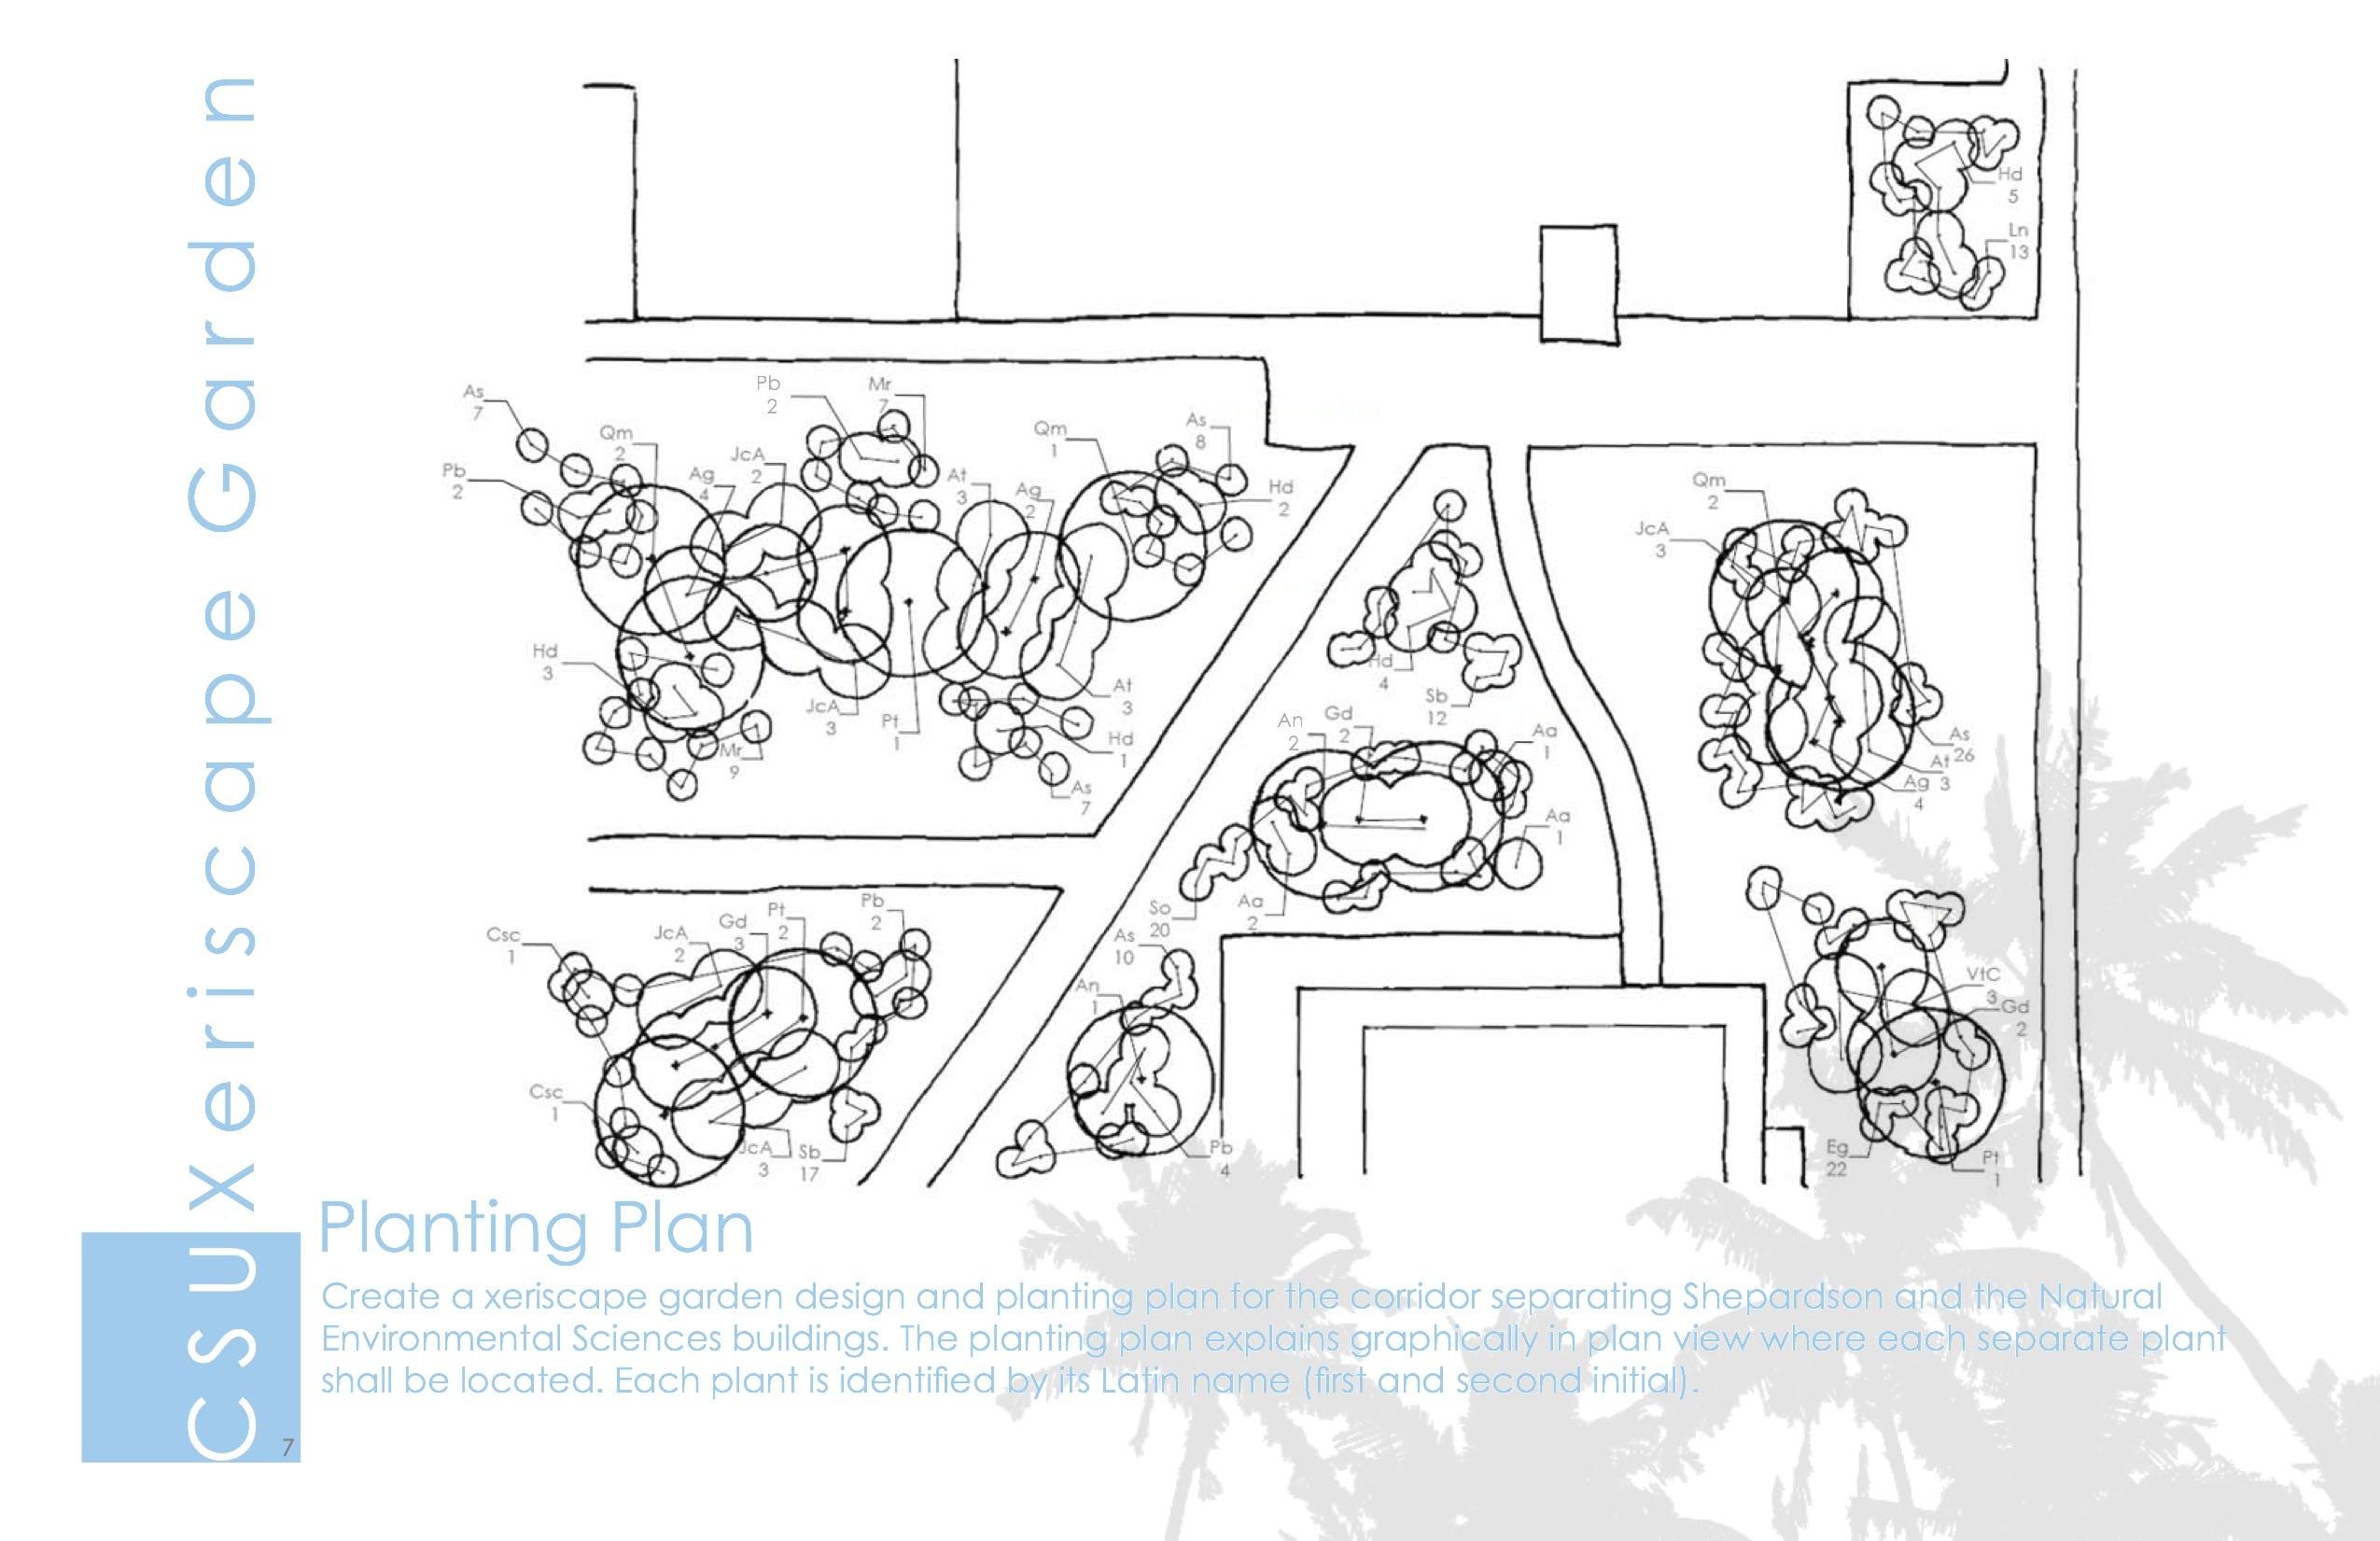 CSU Xeriscape Garden | Jason DeHaan | Archinect